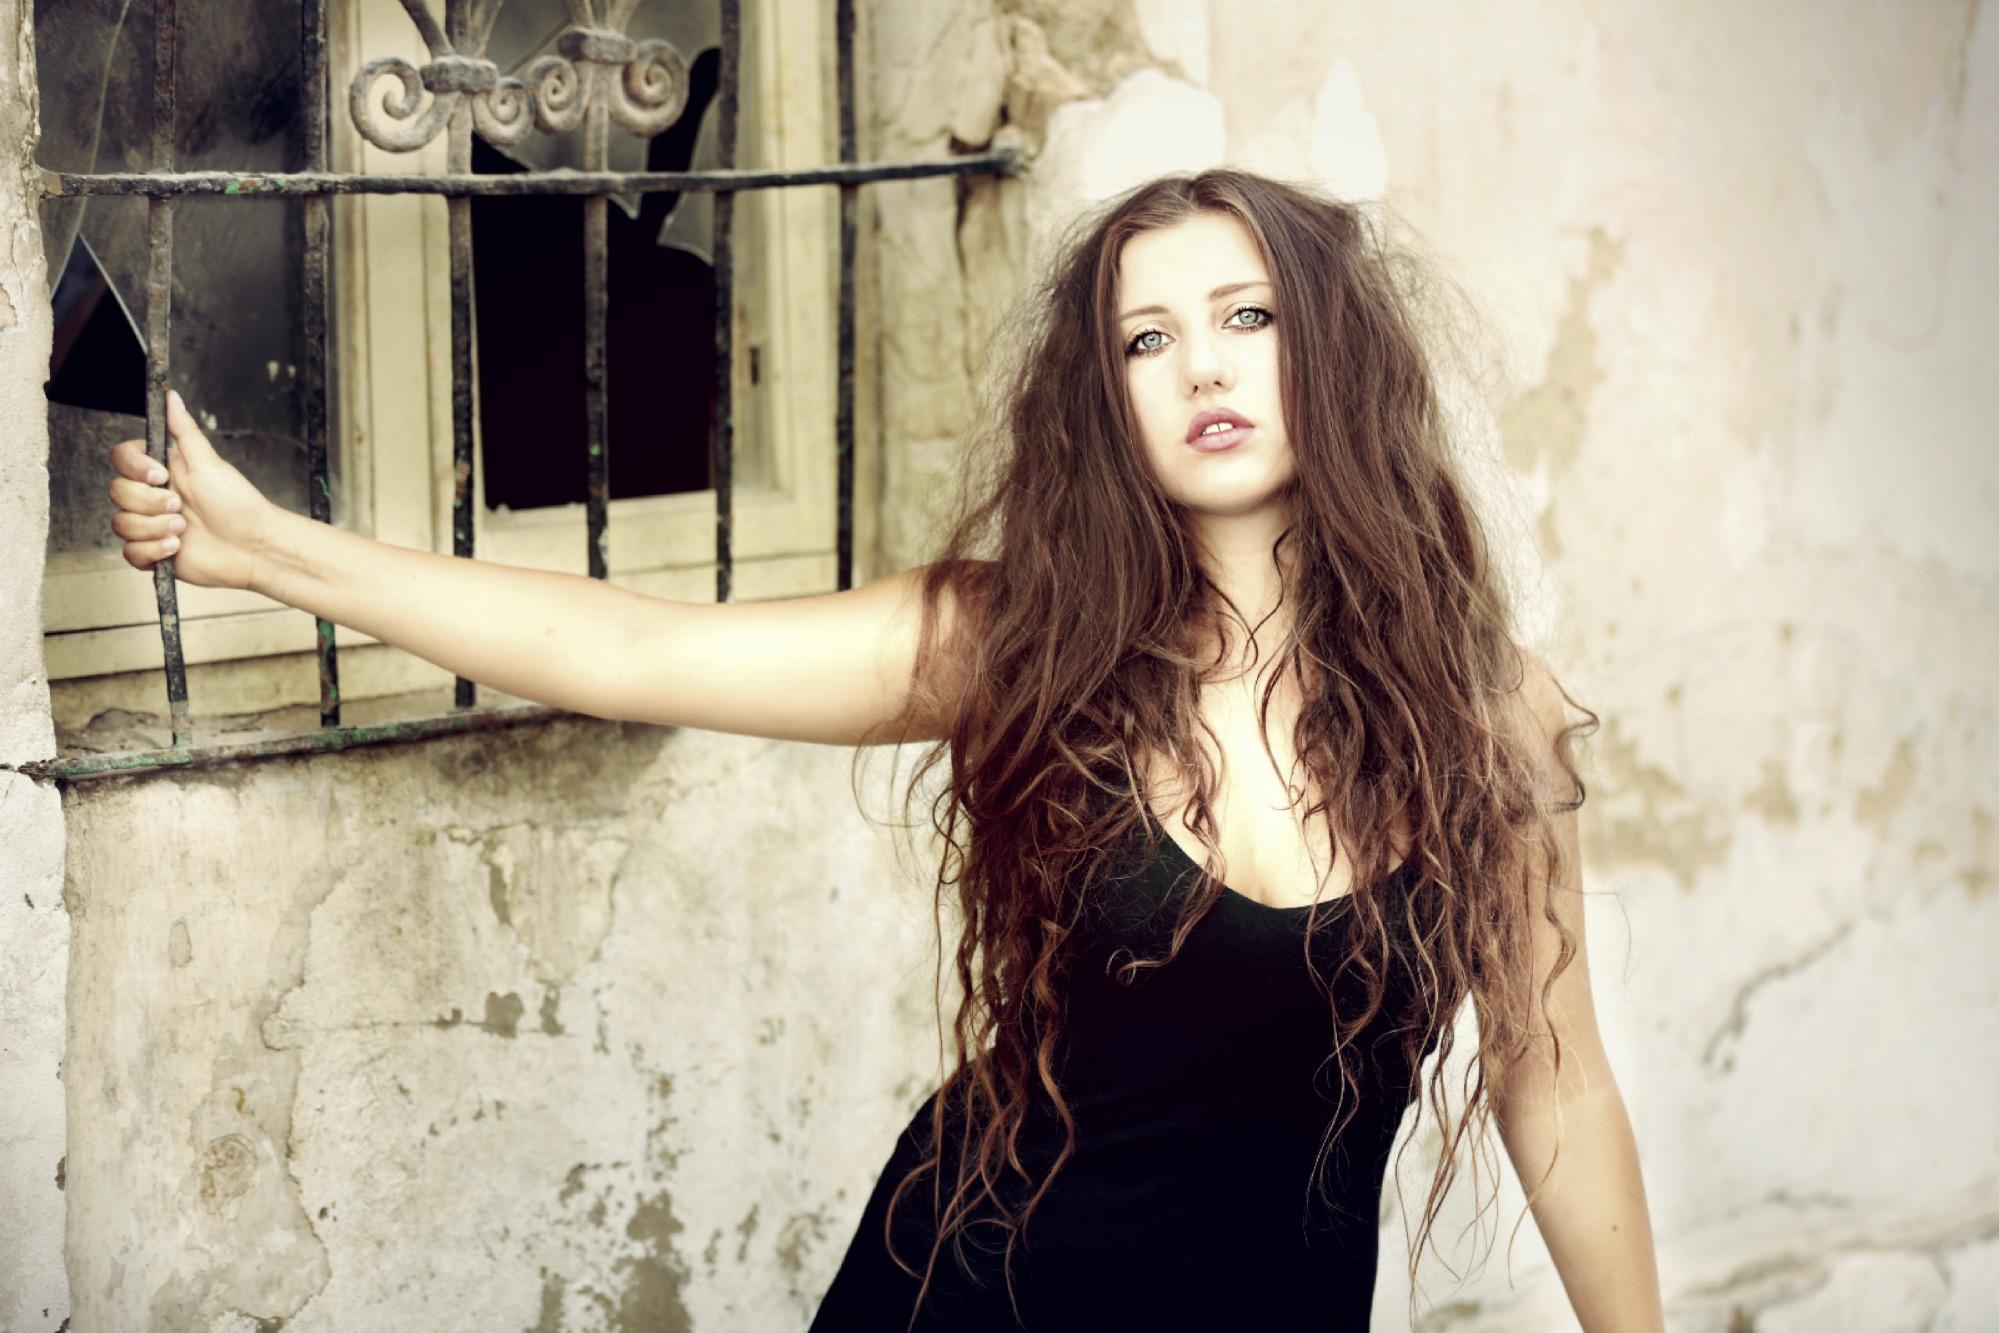 Flora_Camille_by_Jarek_Raczek_Tarifa_02_WEB3